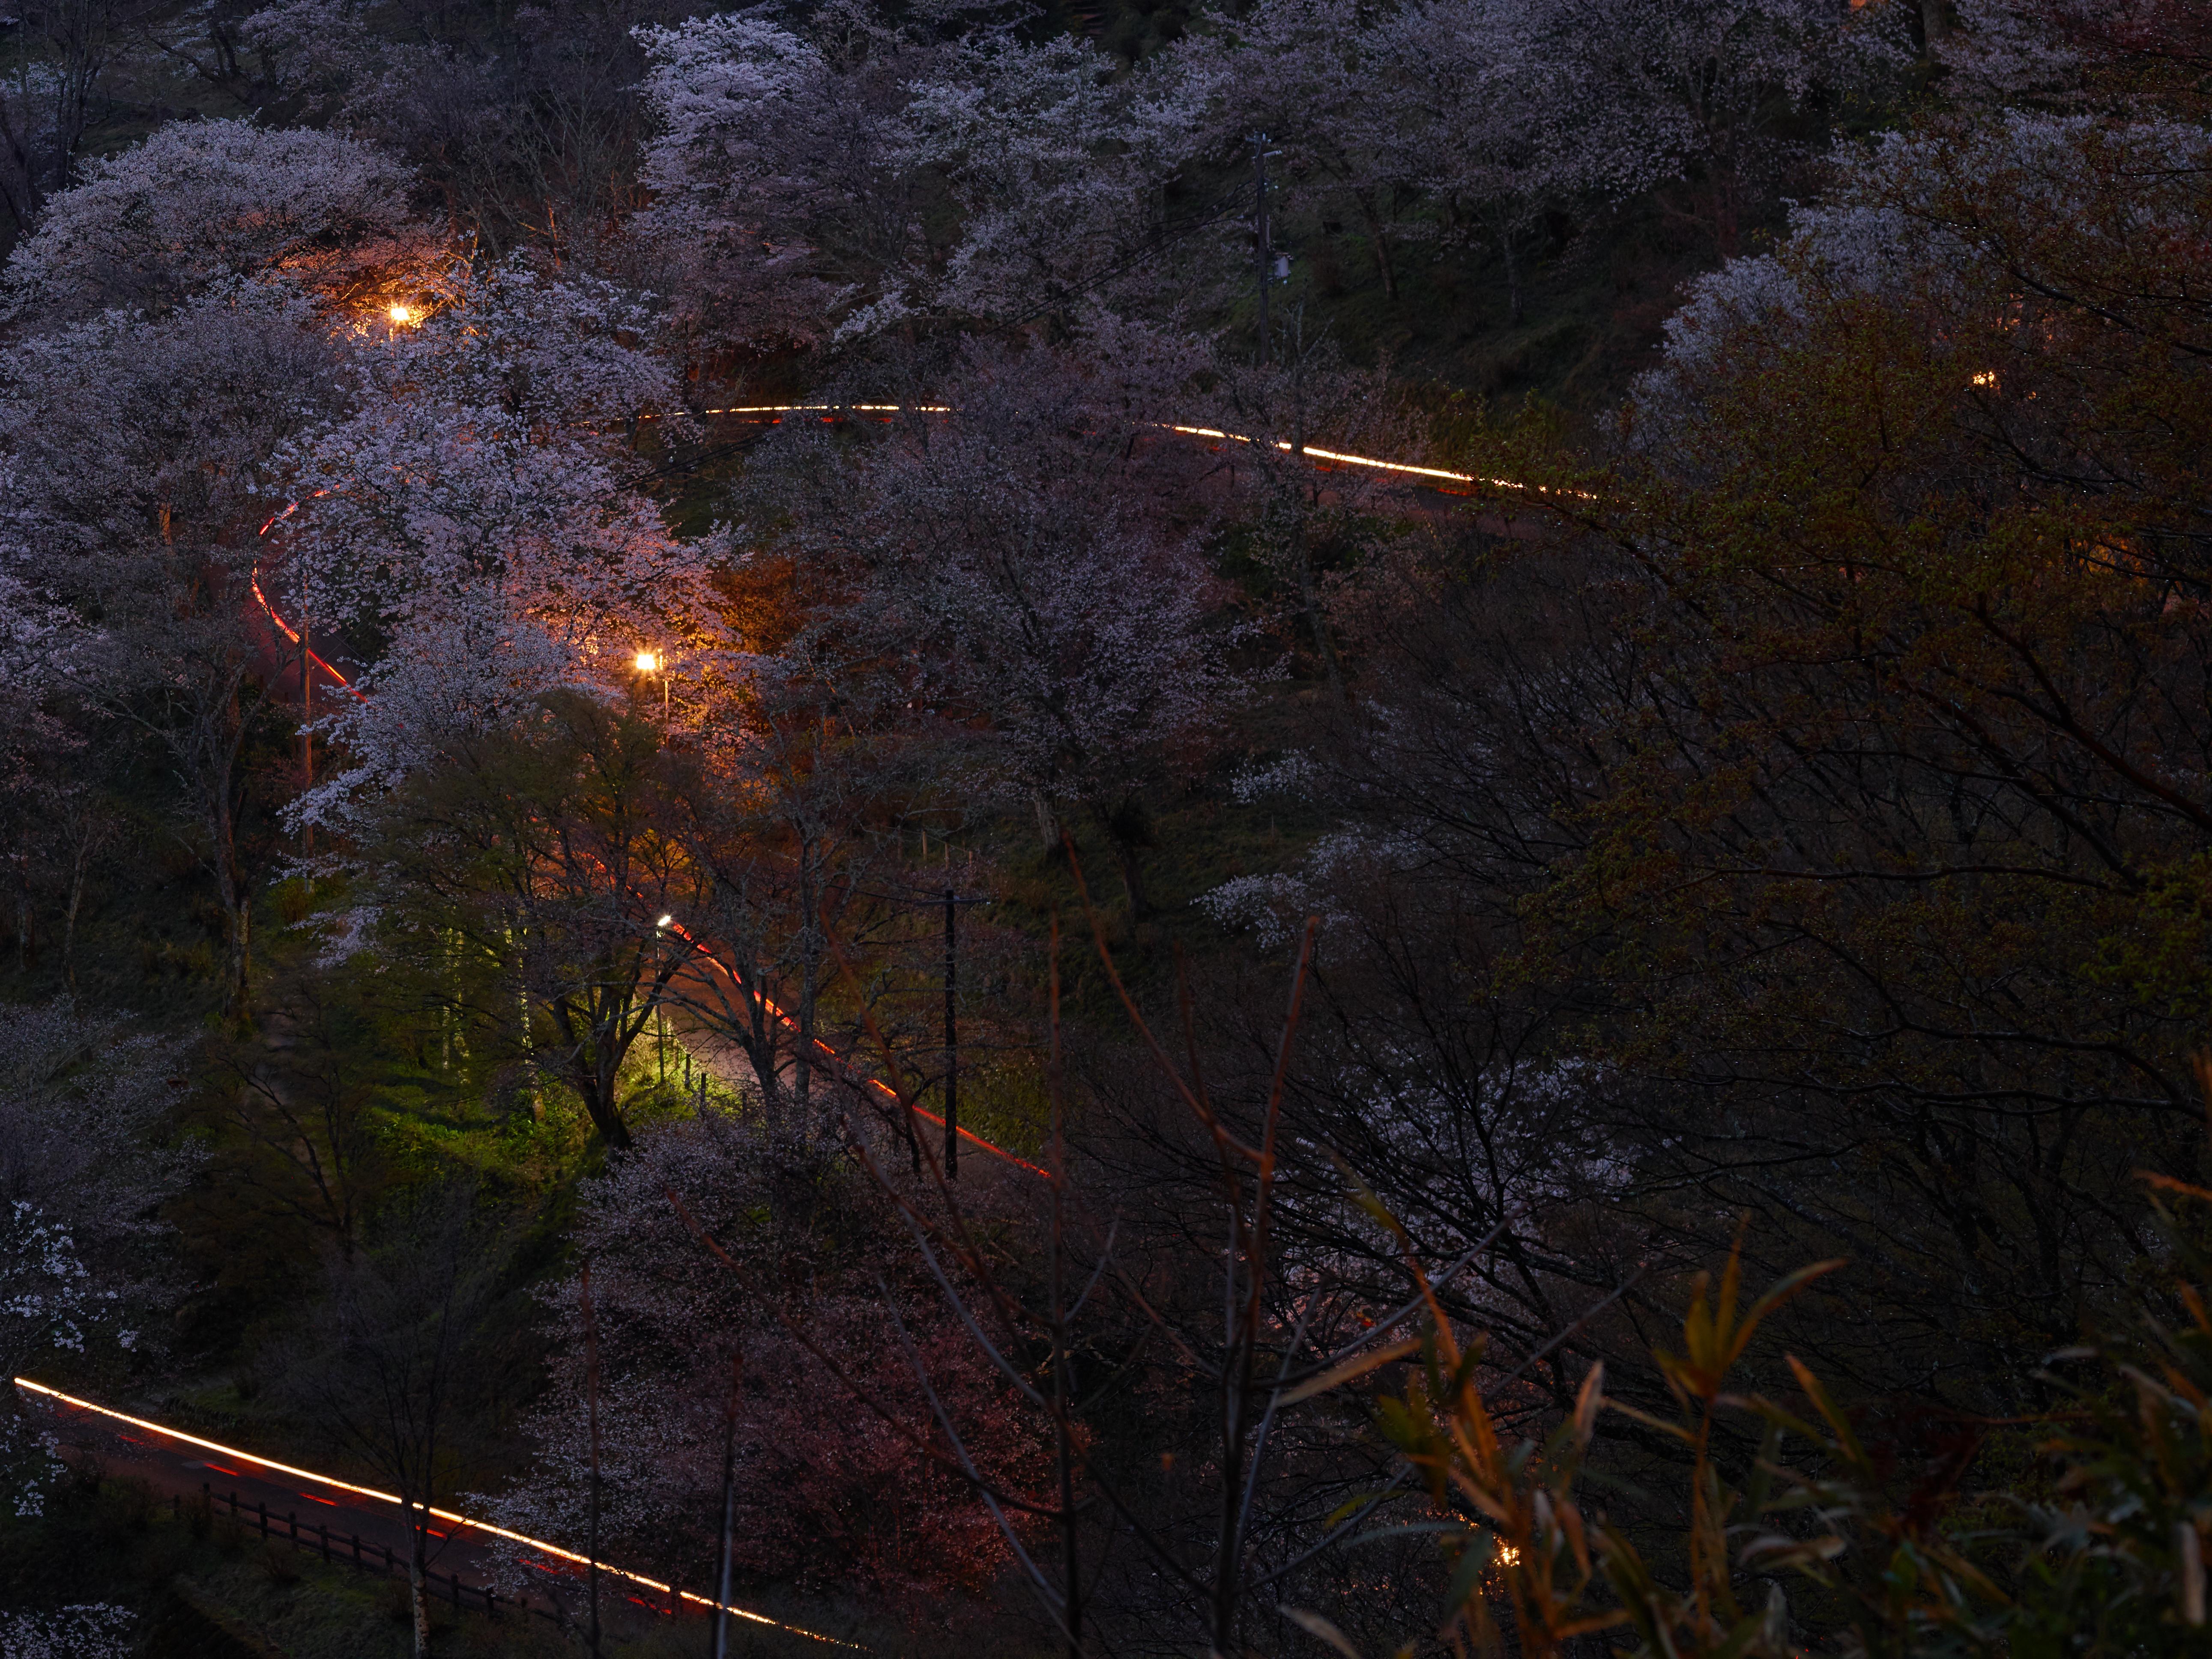 http://www.yaotomi.co.jp/blog/walk/%E5%90%89%E9%87%8E%E5%B1%B1%2C%E6%A1%9C%2CCF014948%2C2017yaotomi%203.jpg